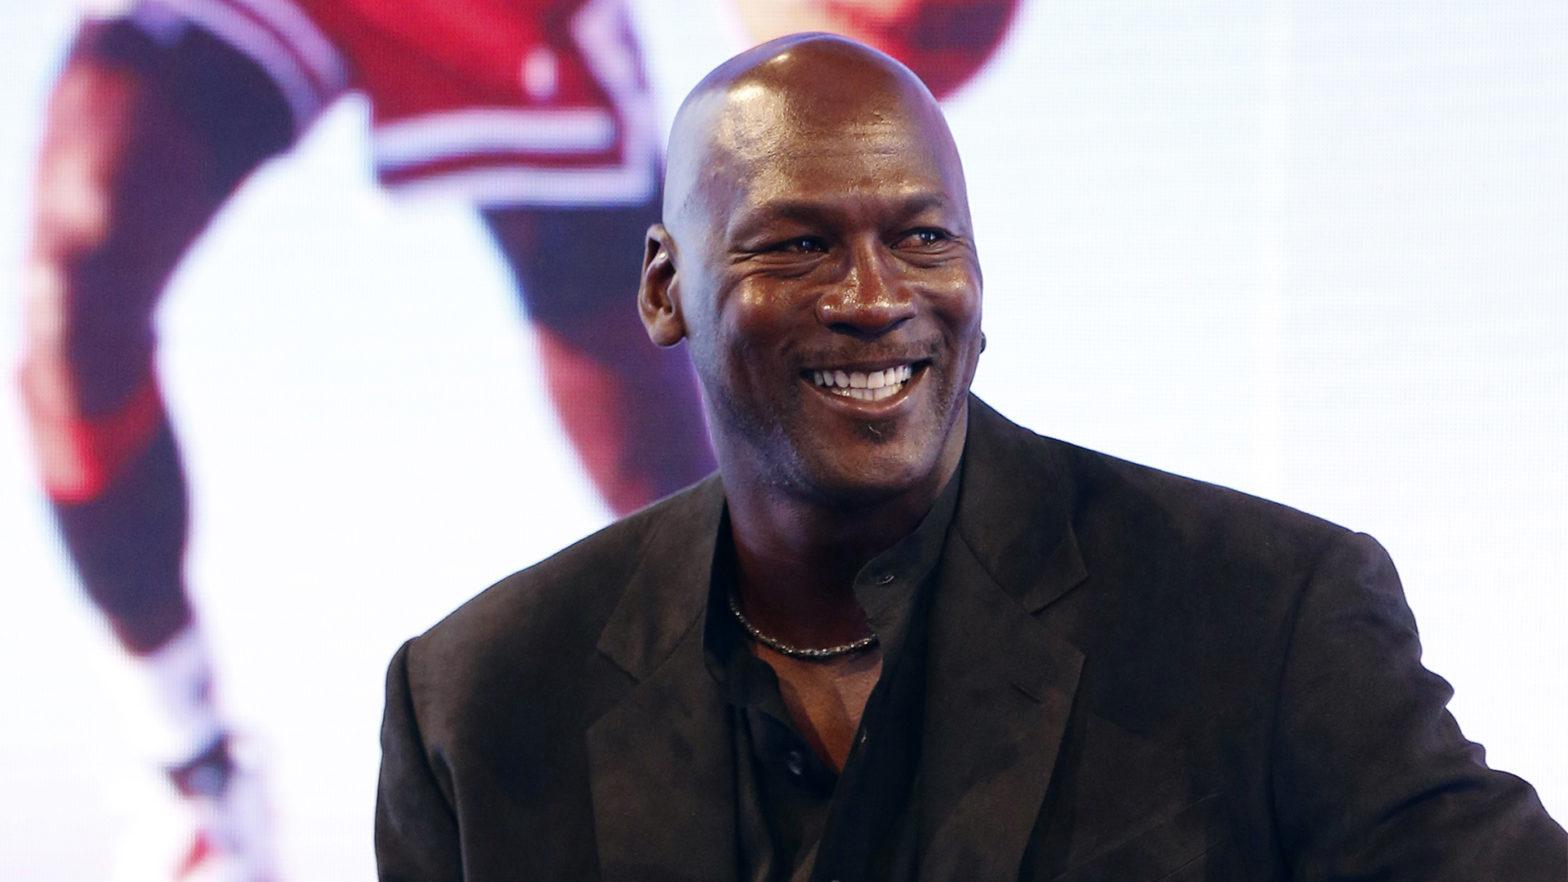 Michael Jordan And The Jordan Brand Pledge $1M To Support Aspiring Black Journalists